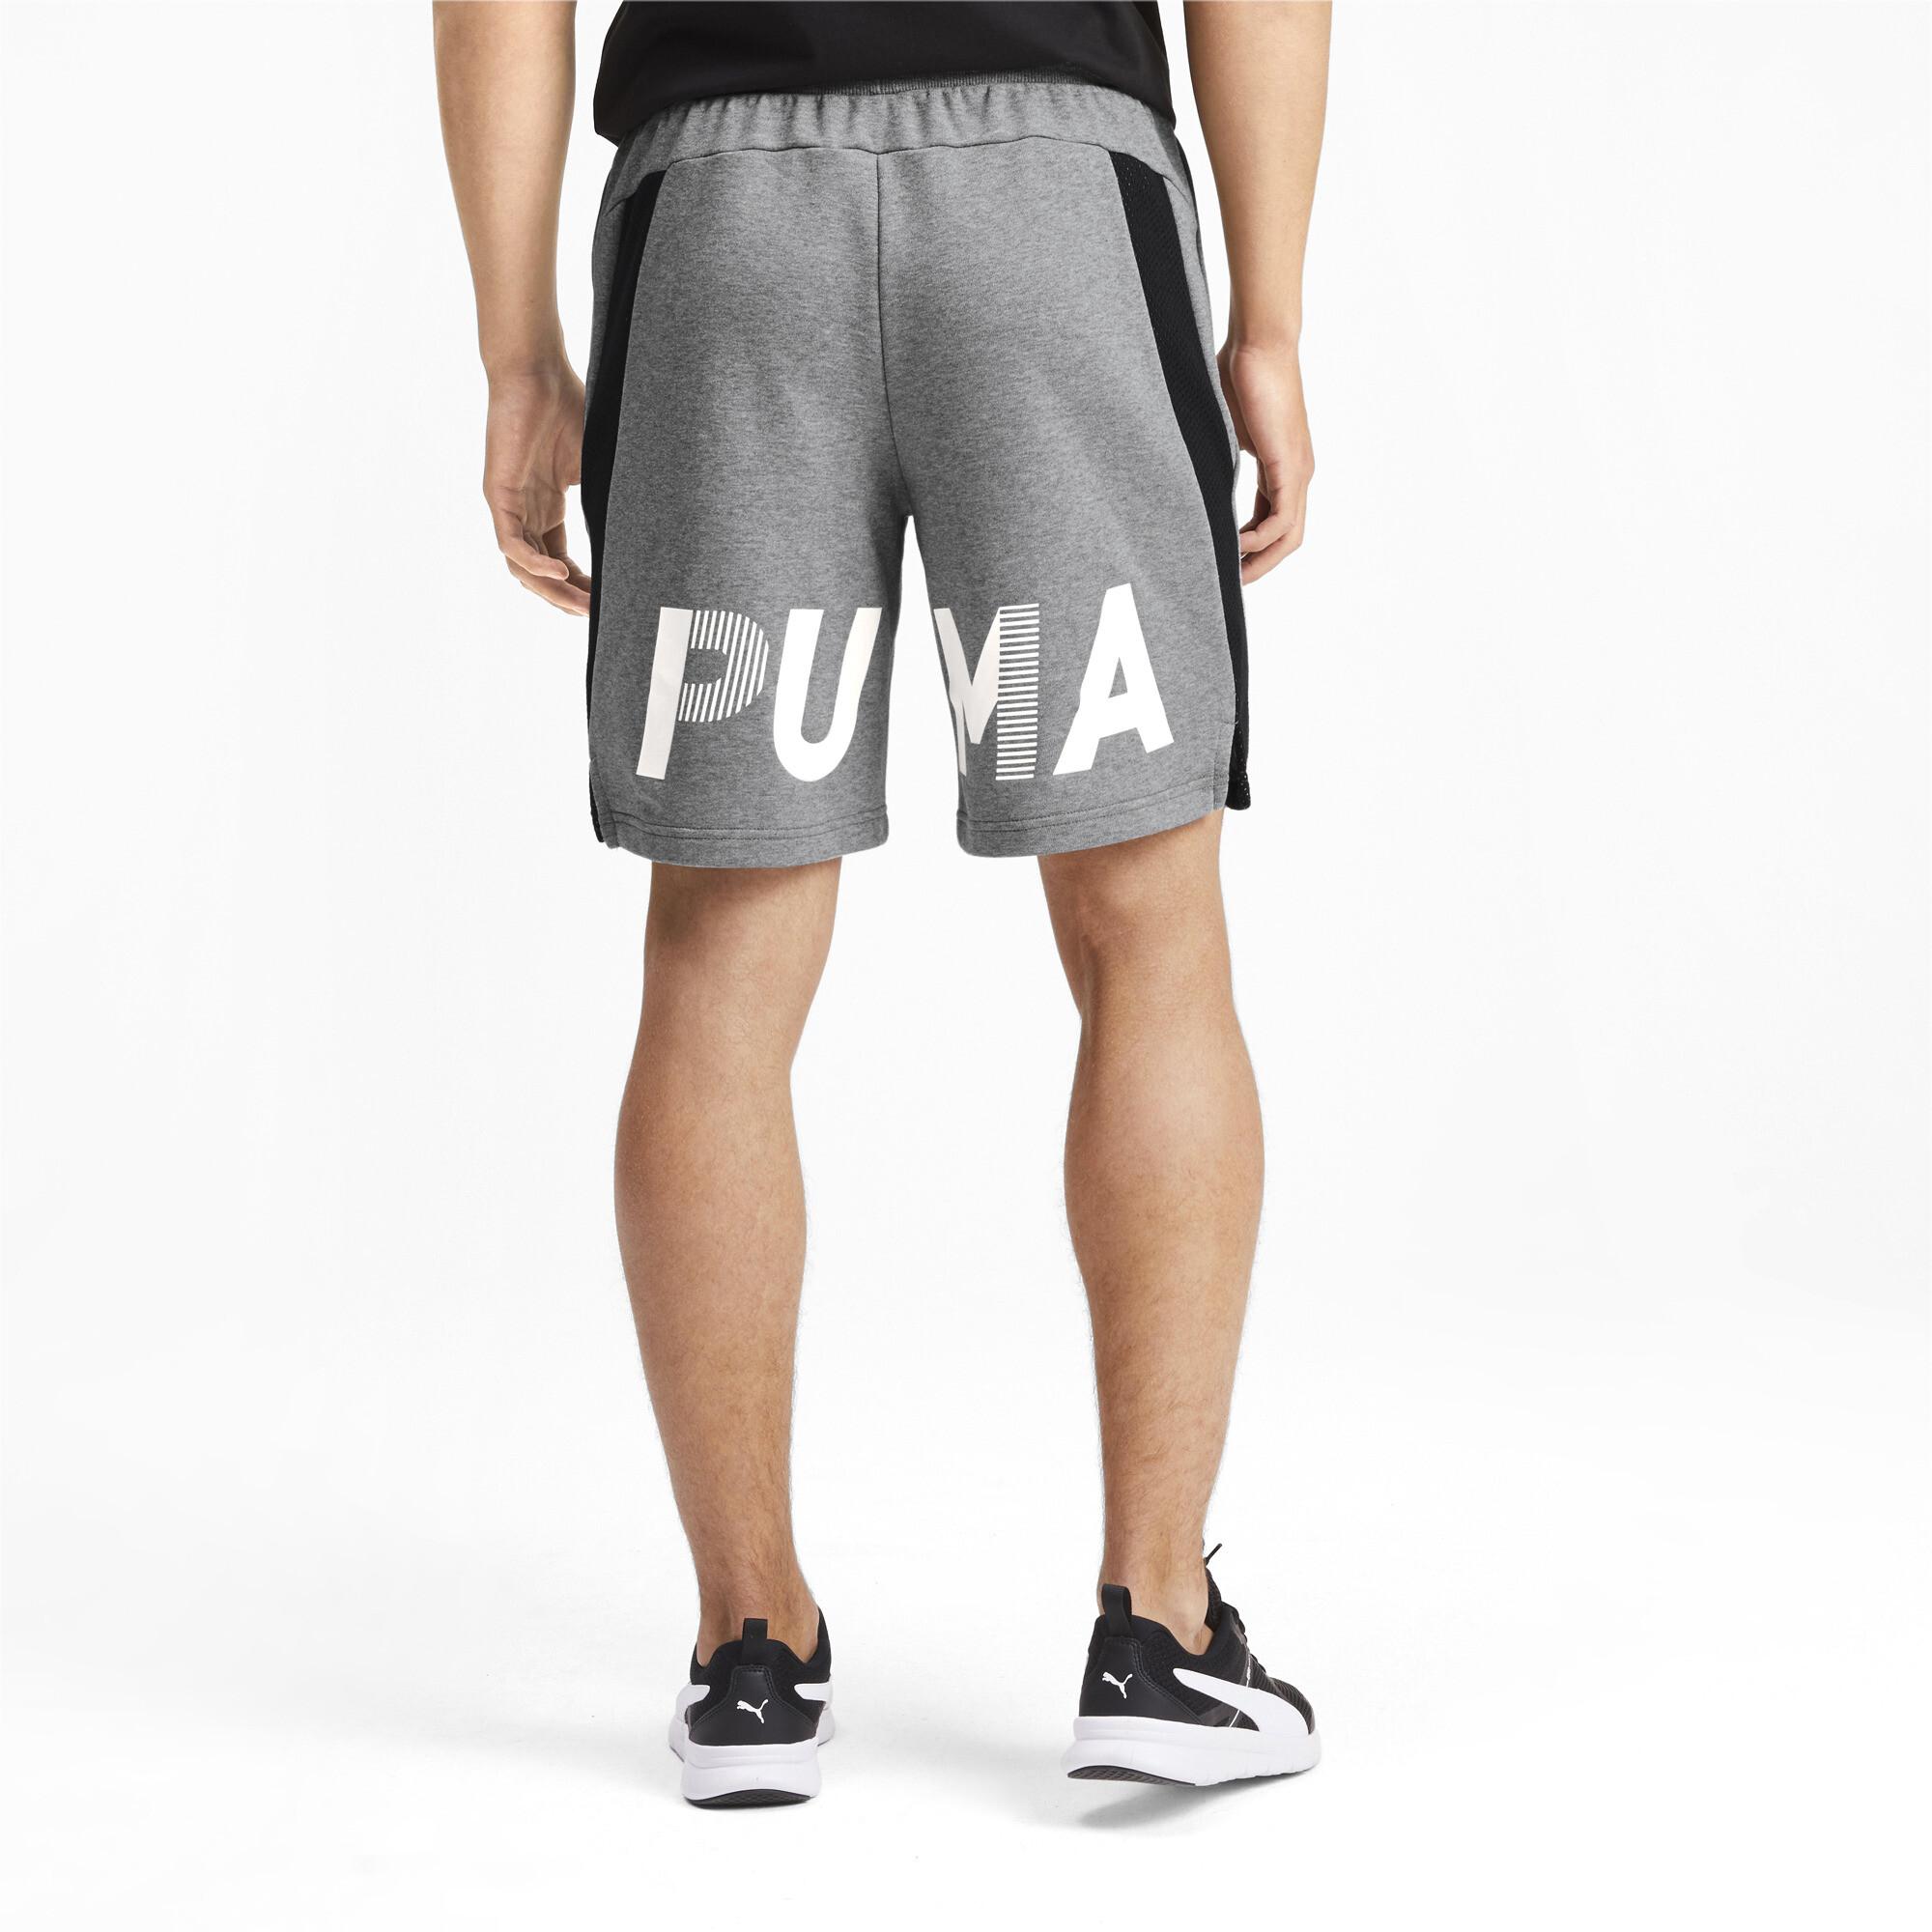 PUMA-Modern-Sports-Men-039-s-Shorts-Men-Knitted-Shorts-Basics thumbnail 10